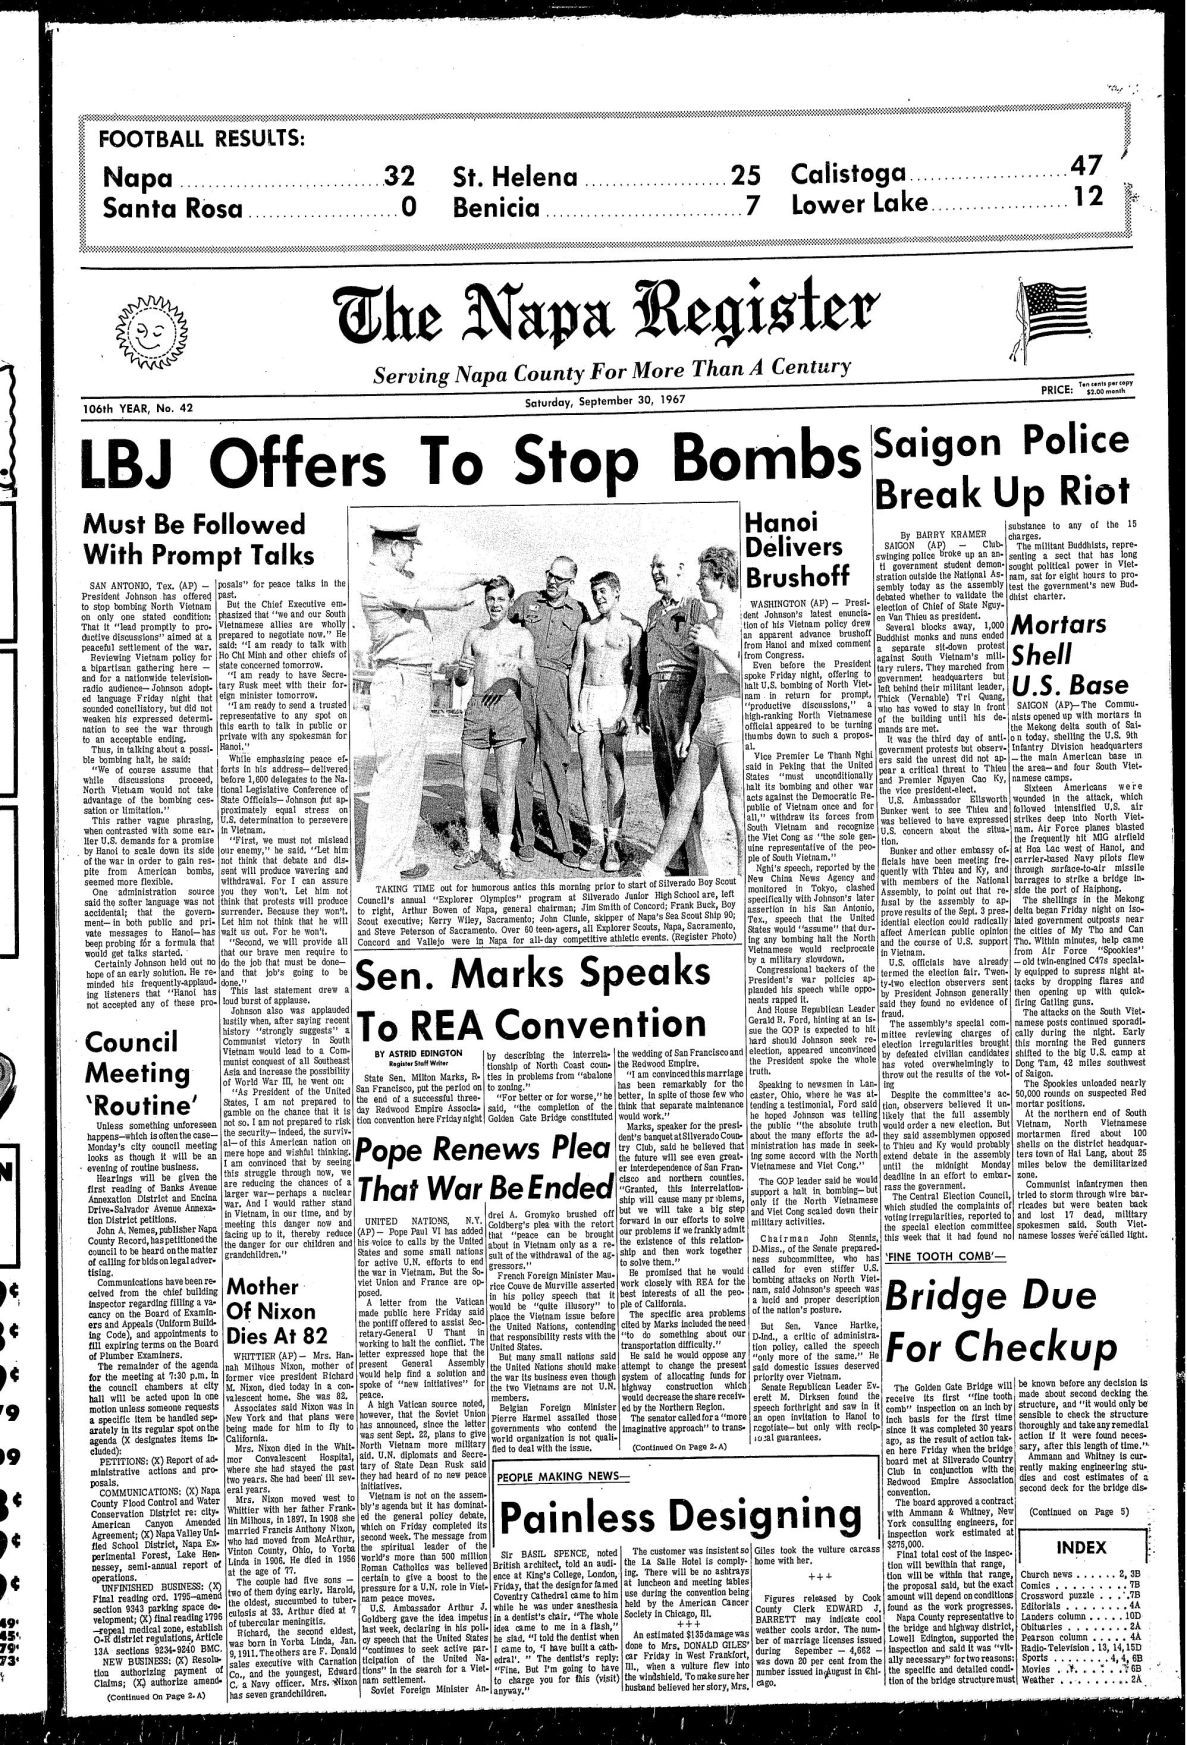 Sept. 30, 1967